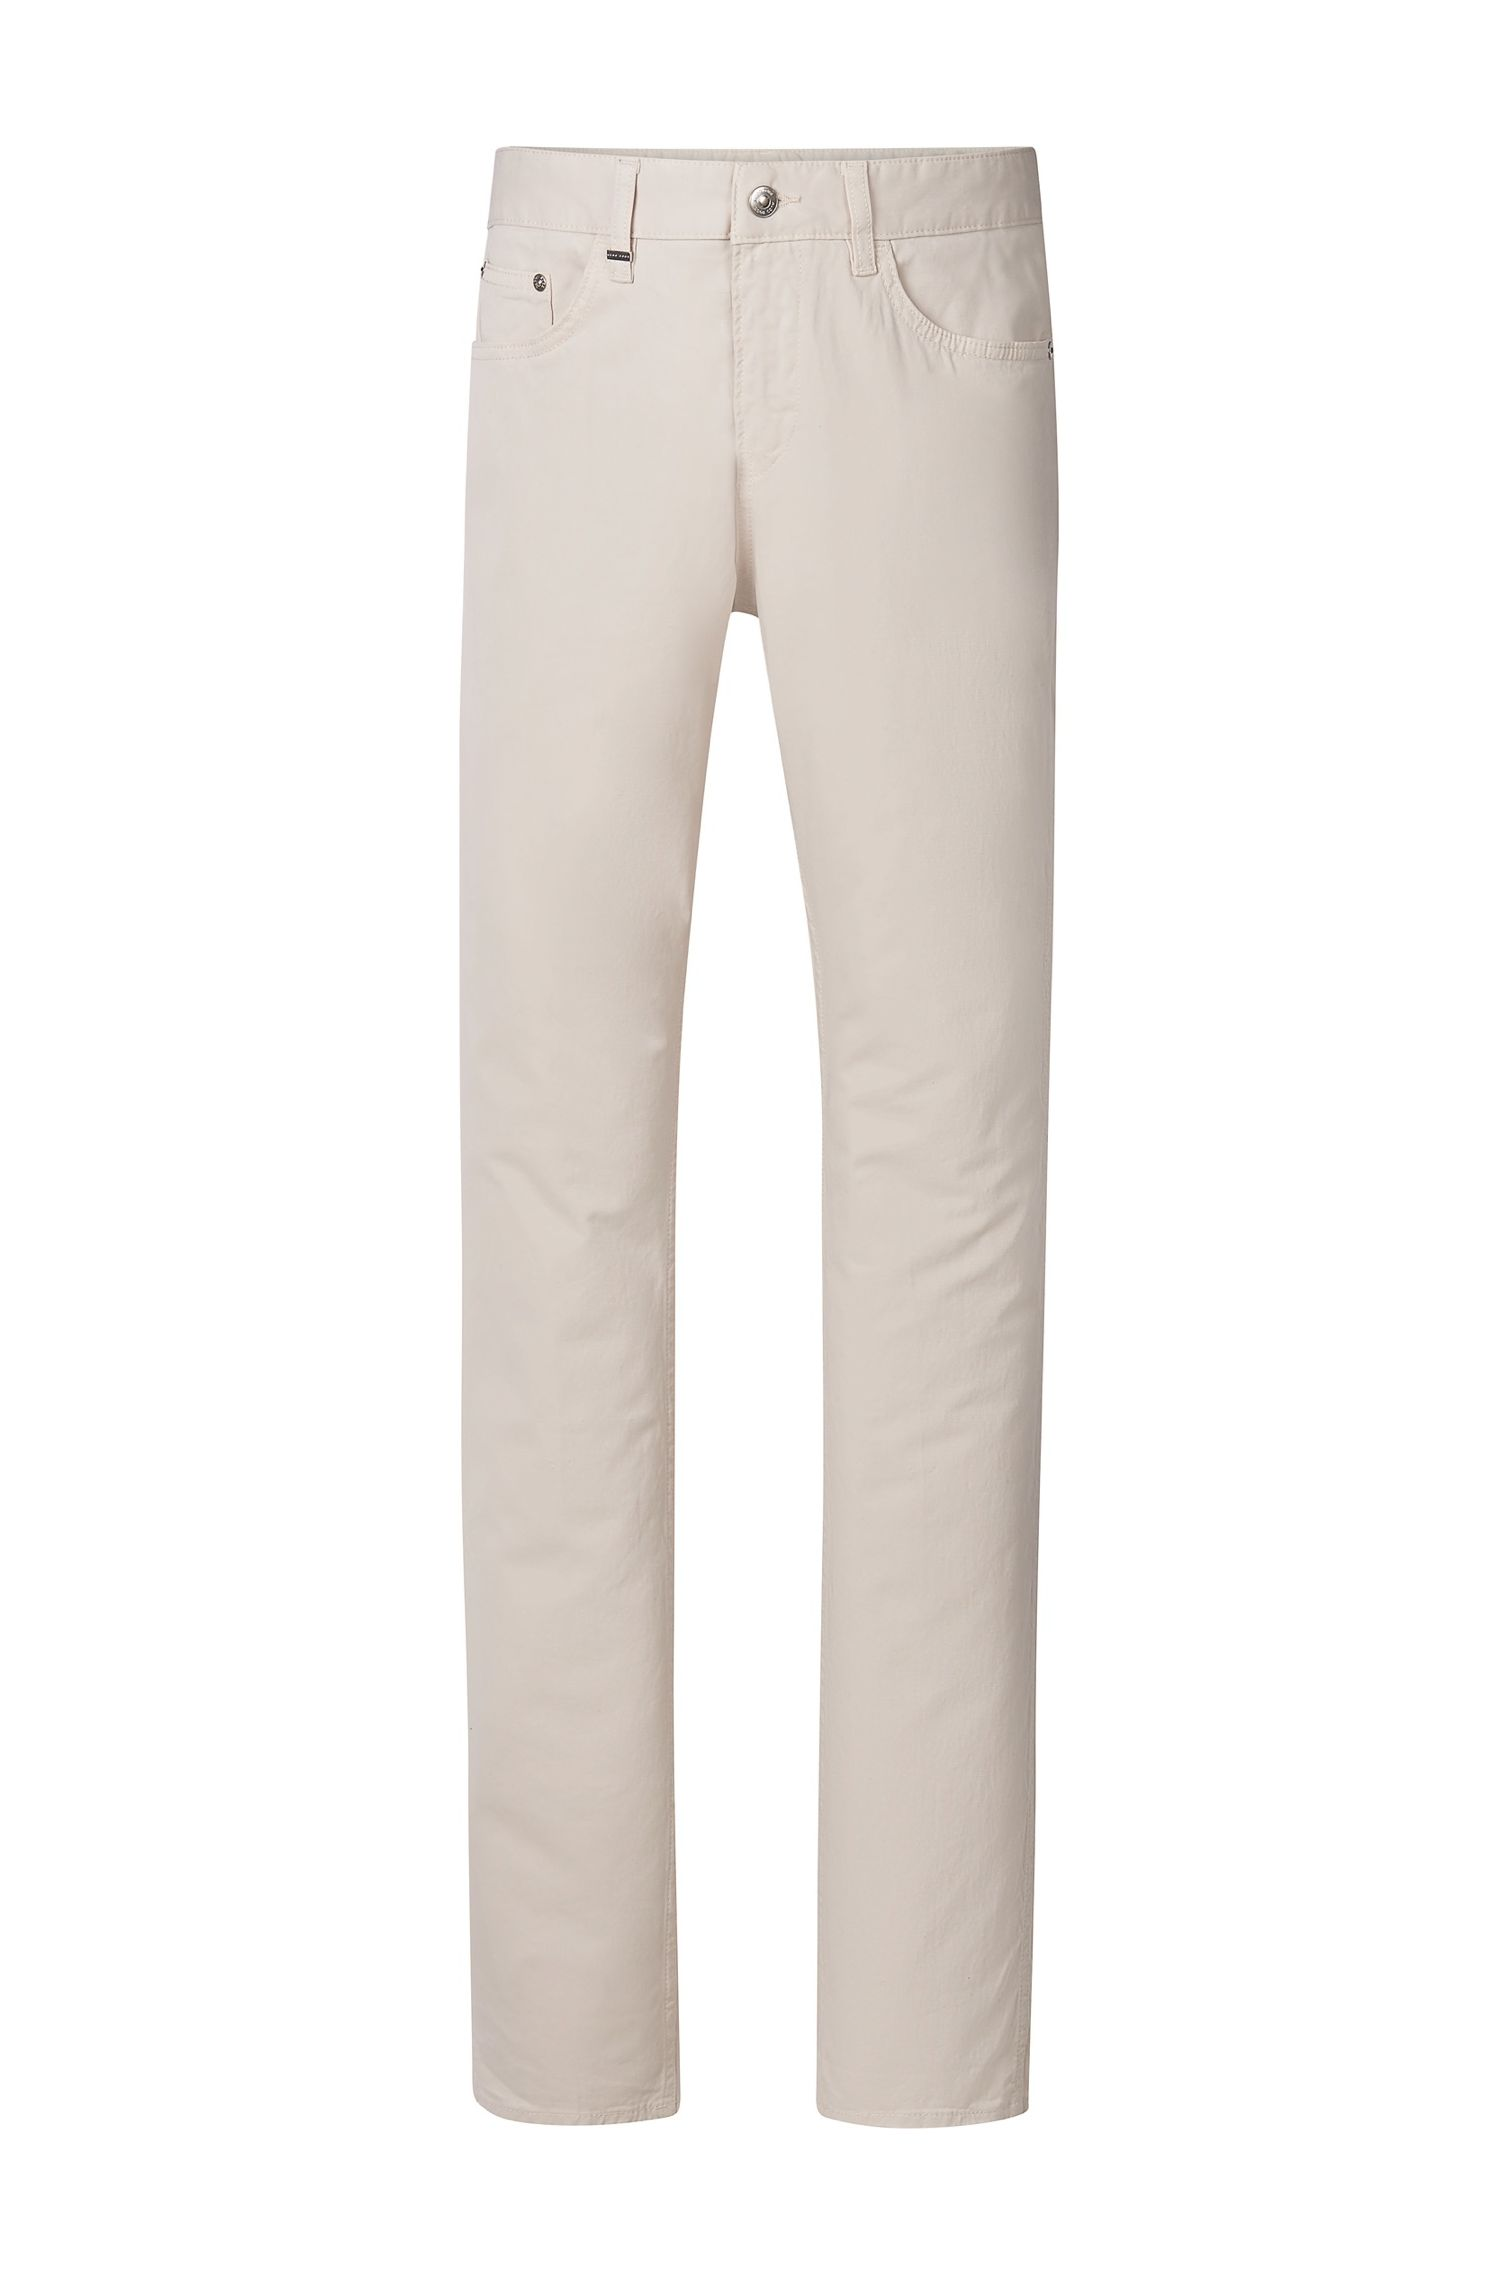 Stretch Cotton Jeans, Slim Fit   Delaware